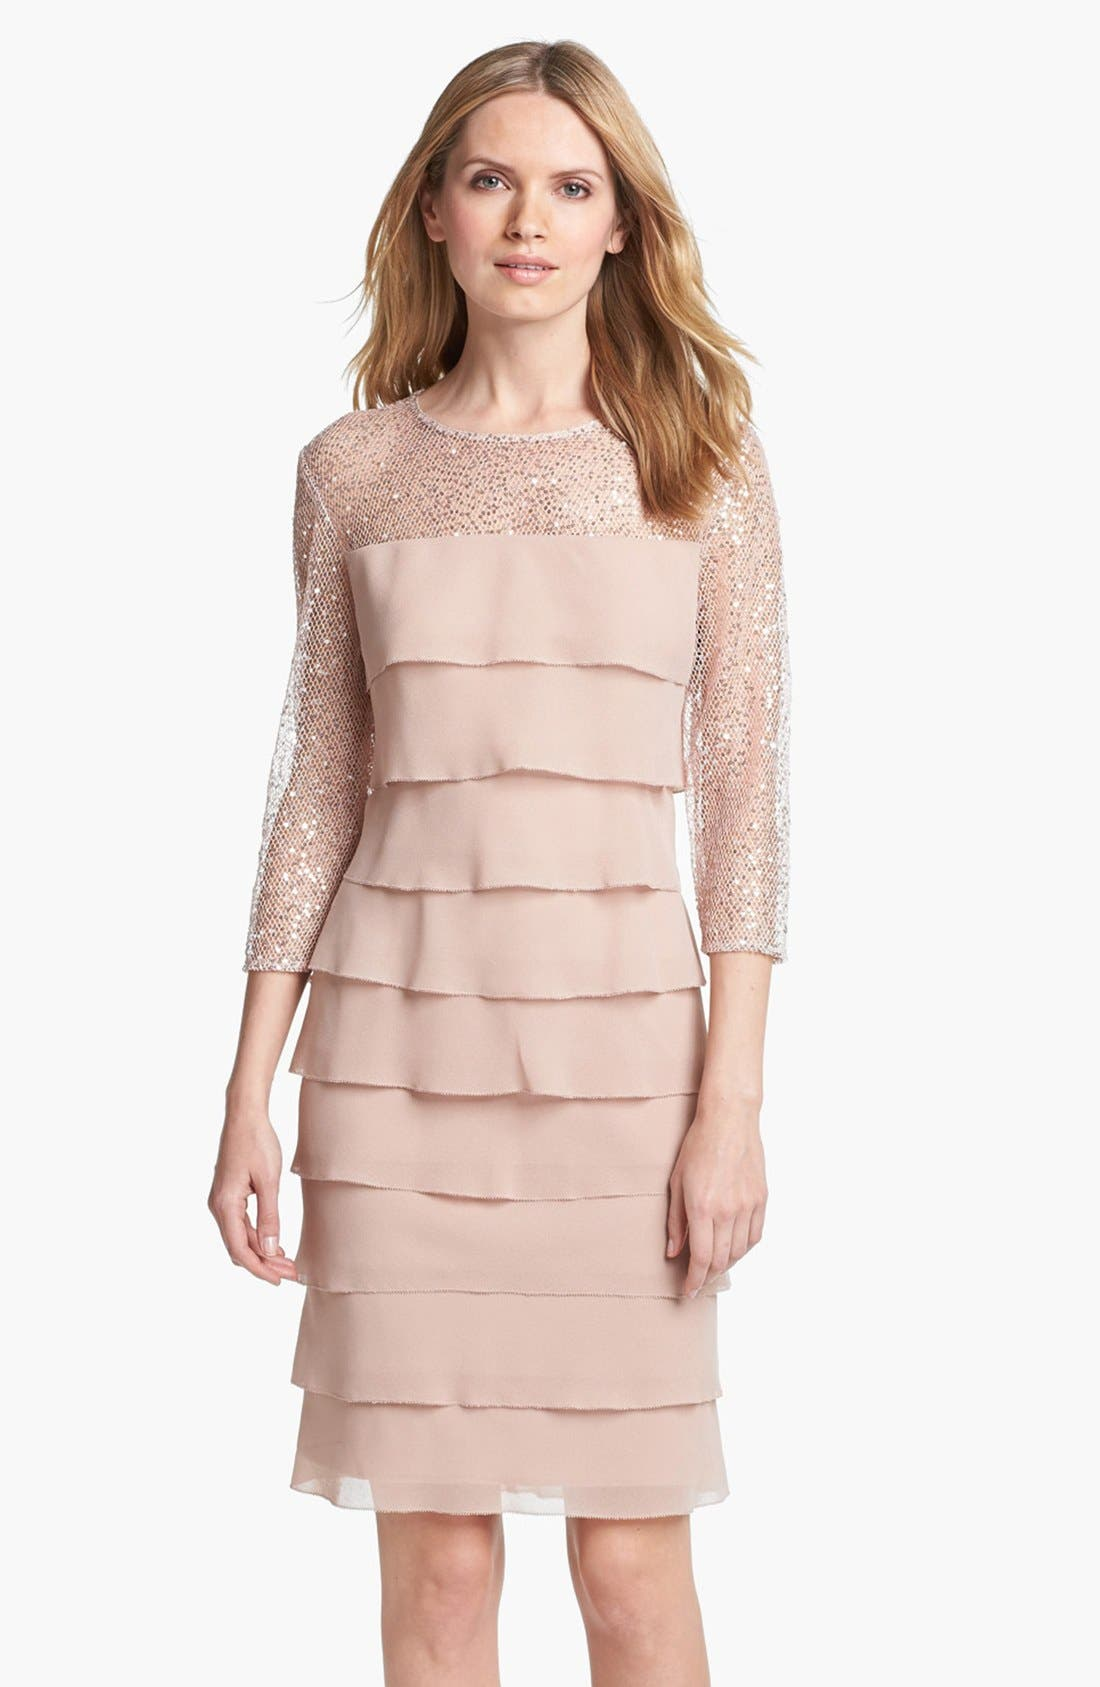 Alternate Image 1 Selected - Alex Evenings Embellished Yoke Tiered Dress (Petite)